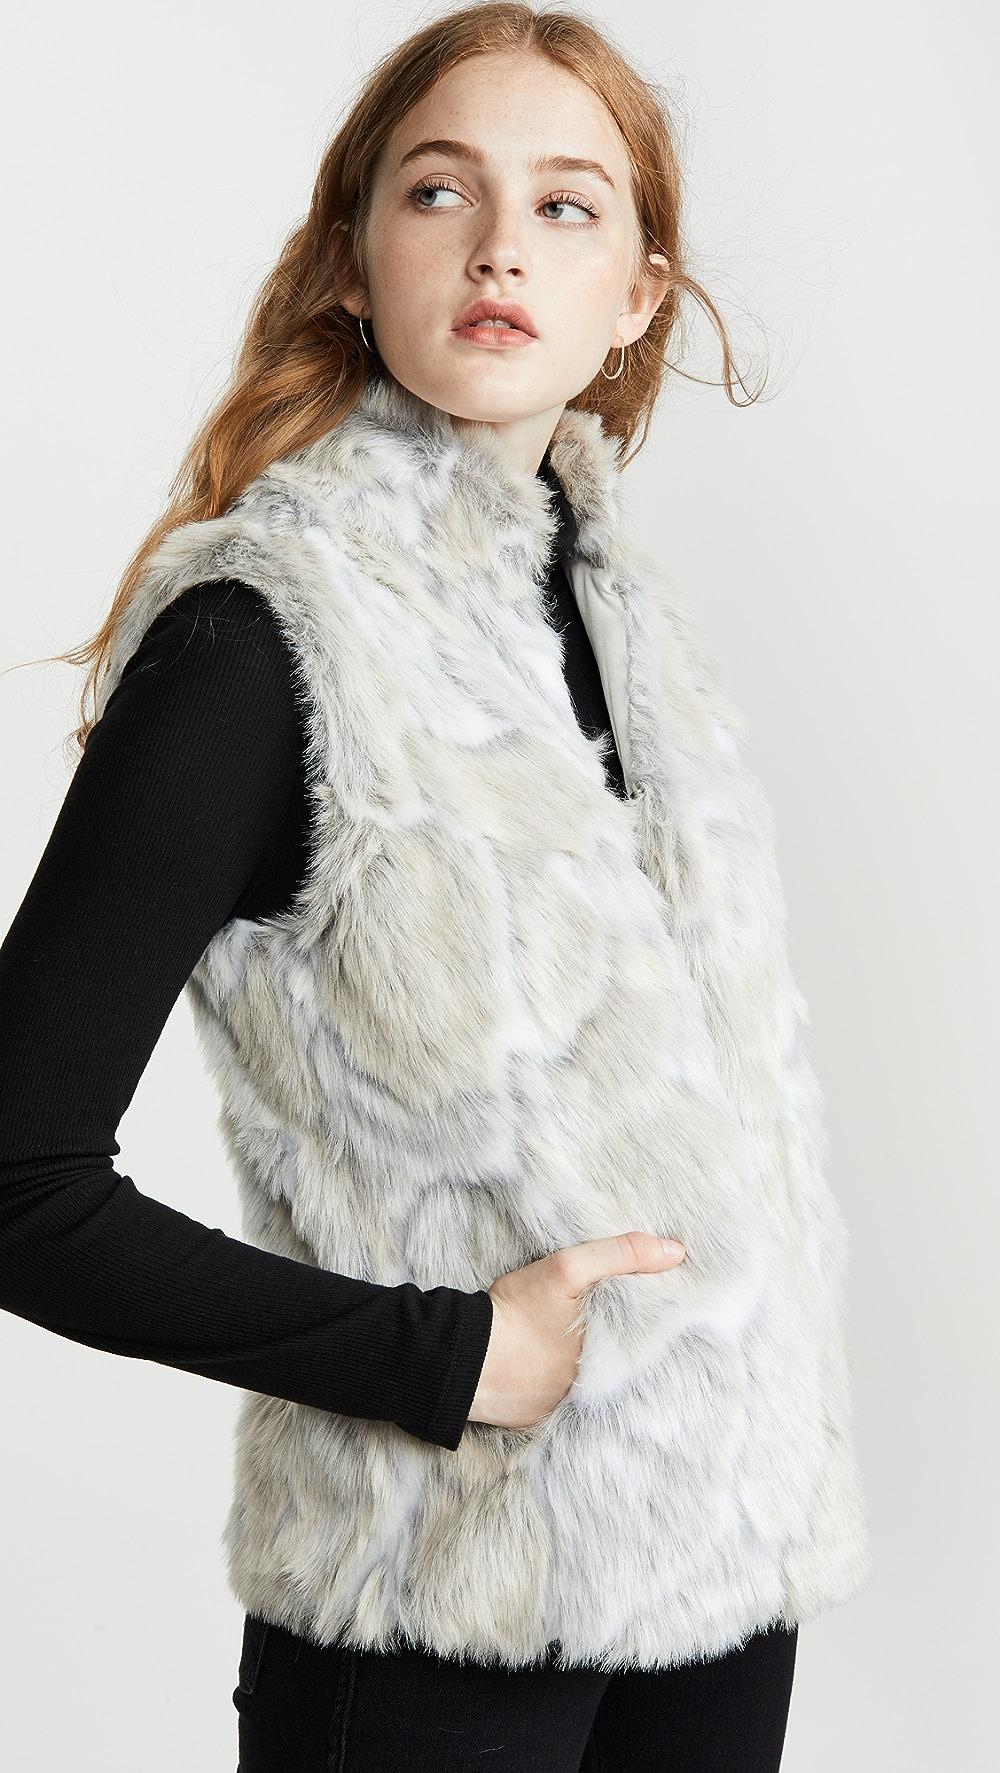 Cheap Sale Bb Dakota - Jack By Bb Dakota In A Furry Faux Fur Vest Invigorating Blood Circulation And Stopping Pains